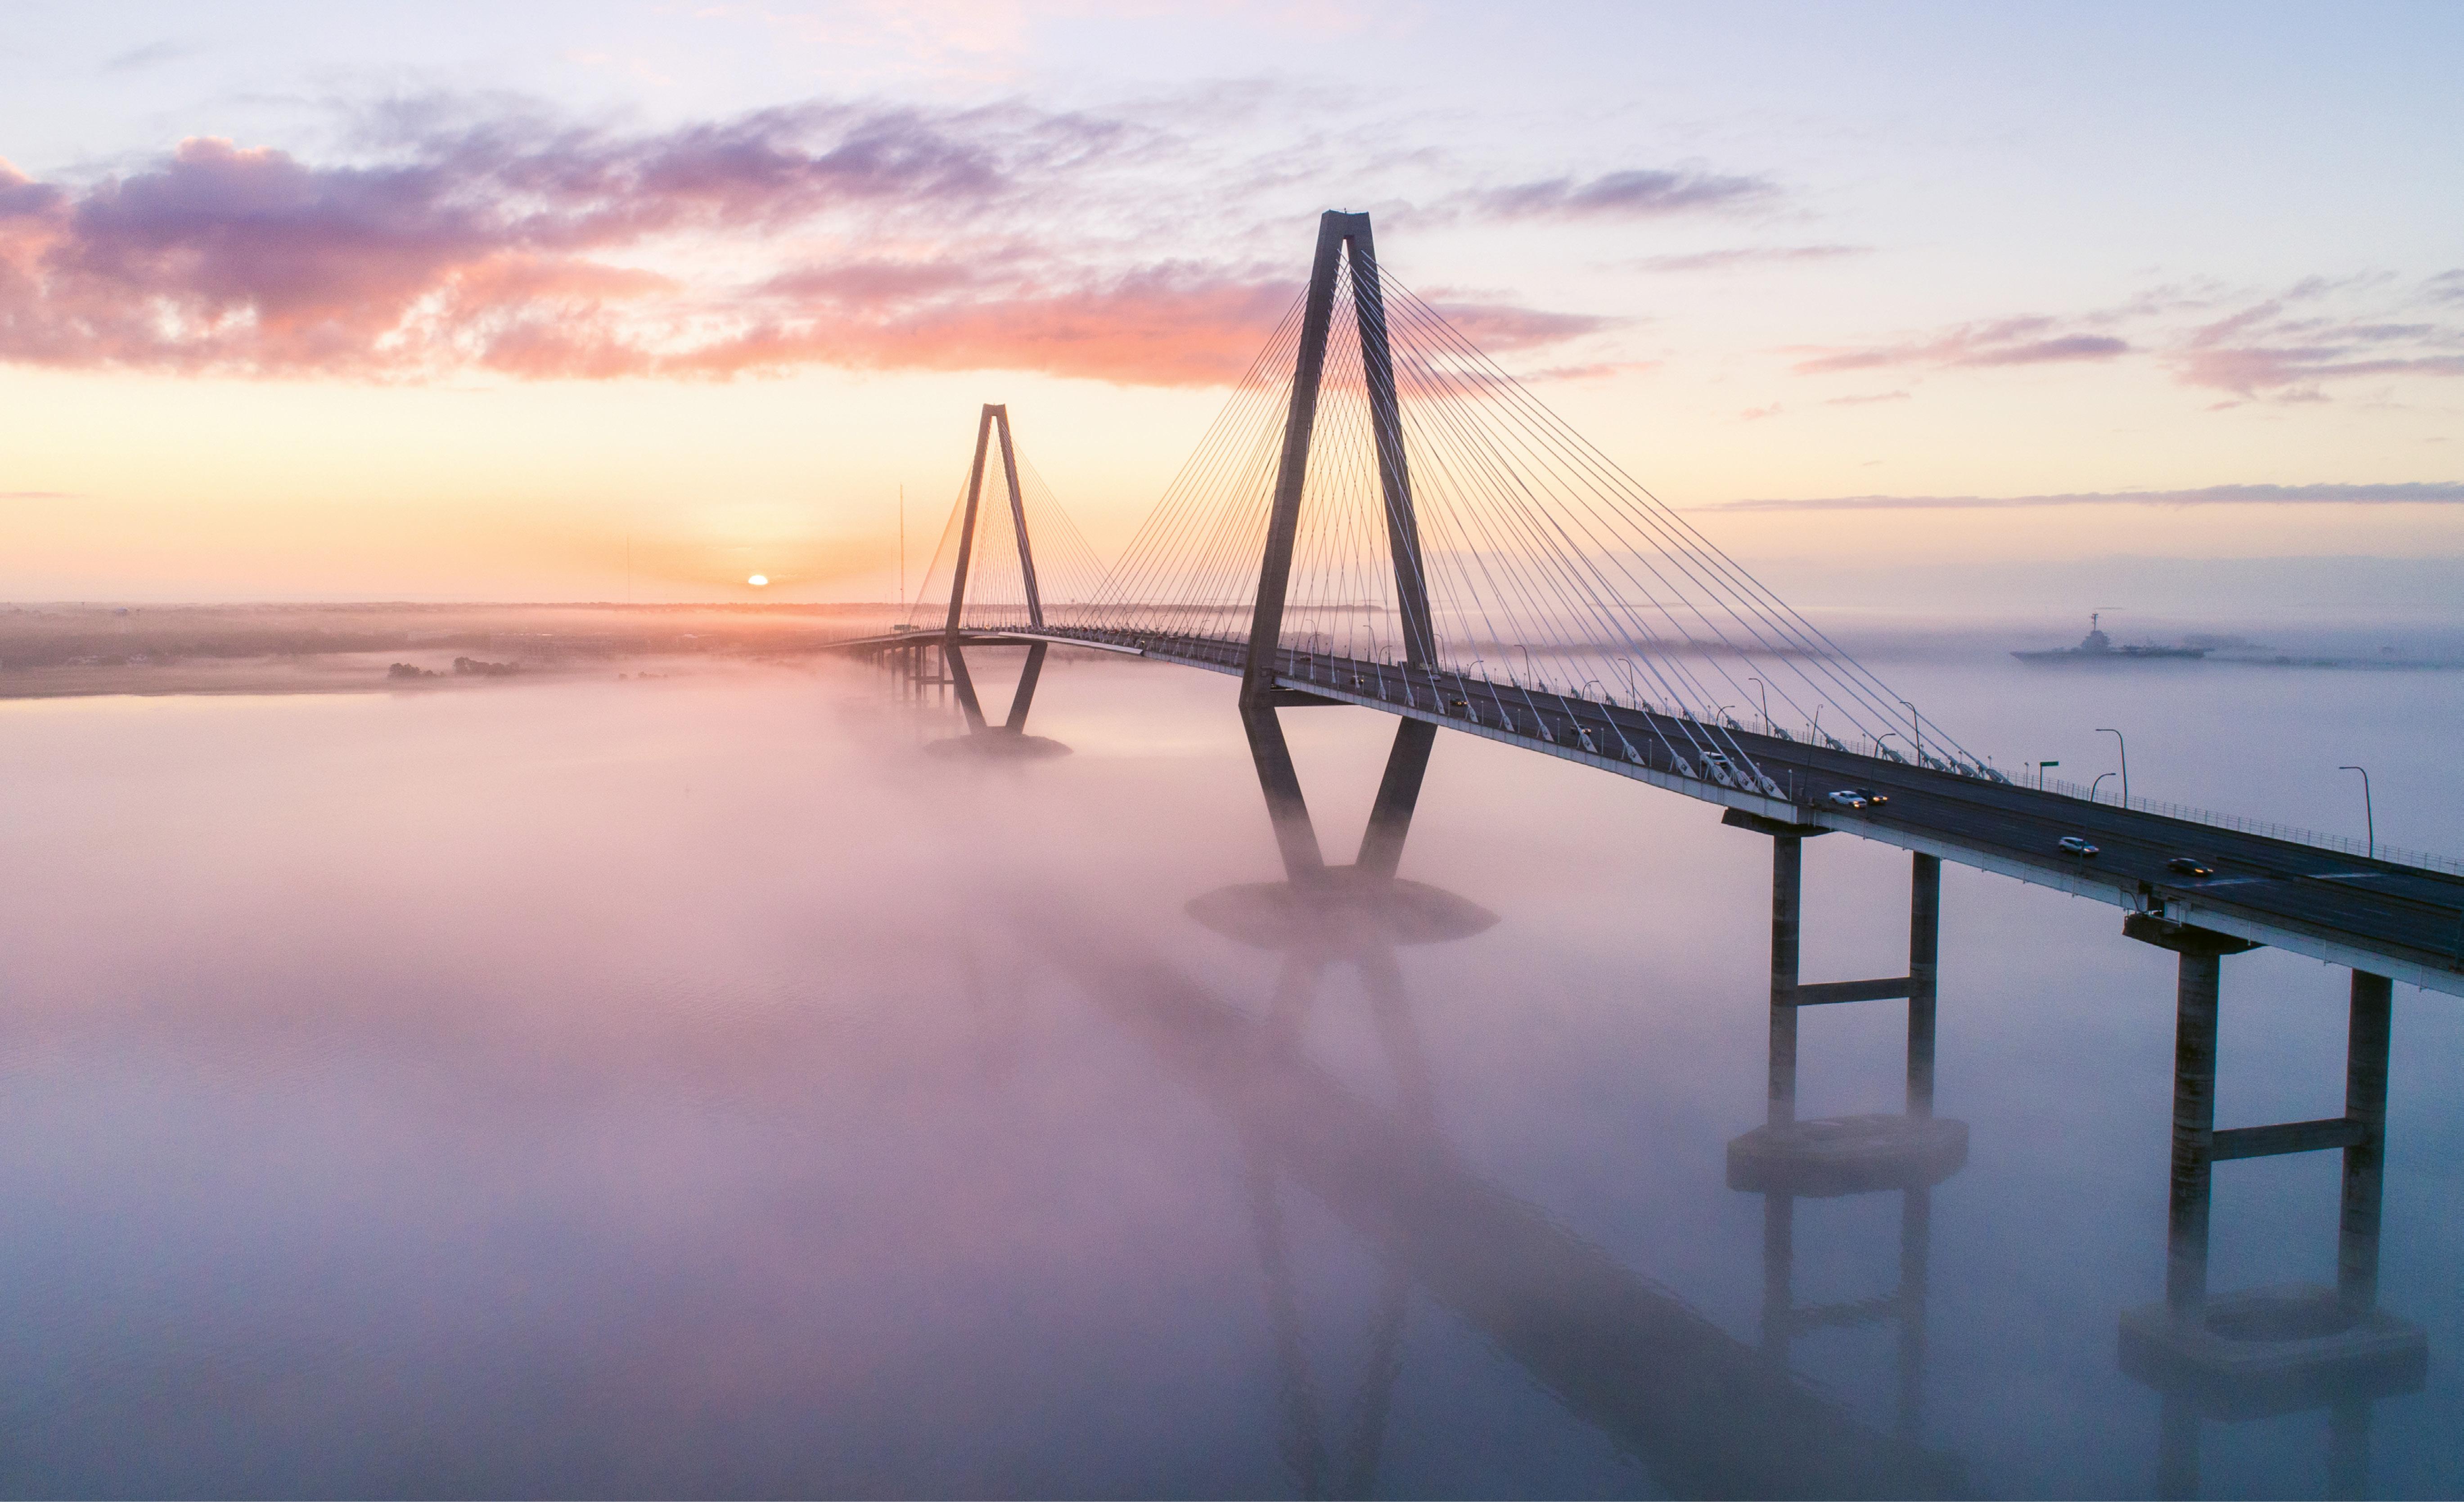 """Sea Fog at Sunrise"" {Altitude: 255 feet} In late February, a blanket of fog hovers below the Arthur Ravenel Bridge, reflecting the sunrise."